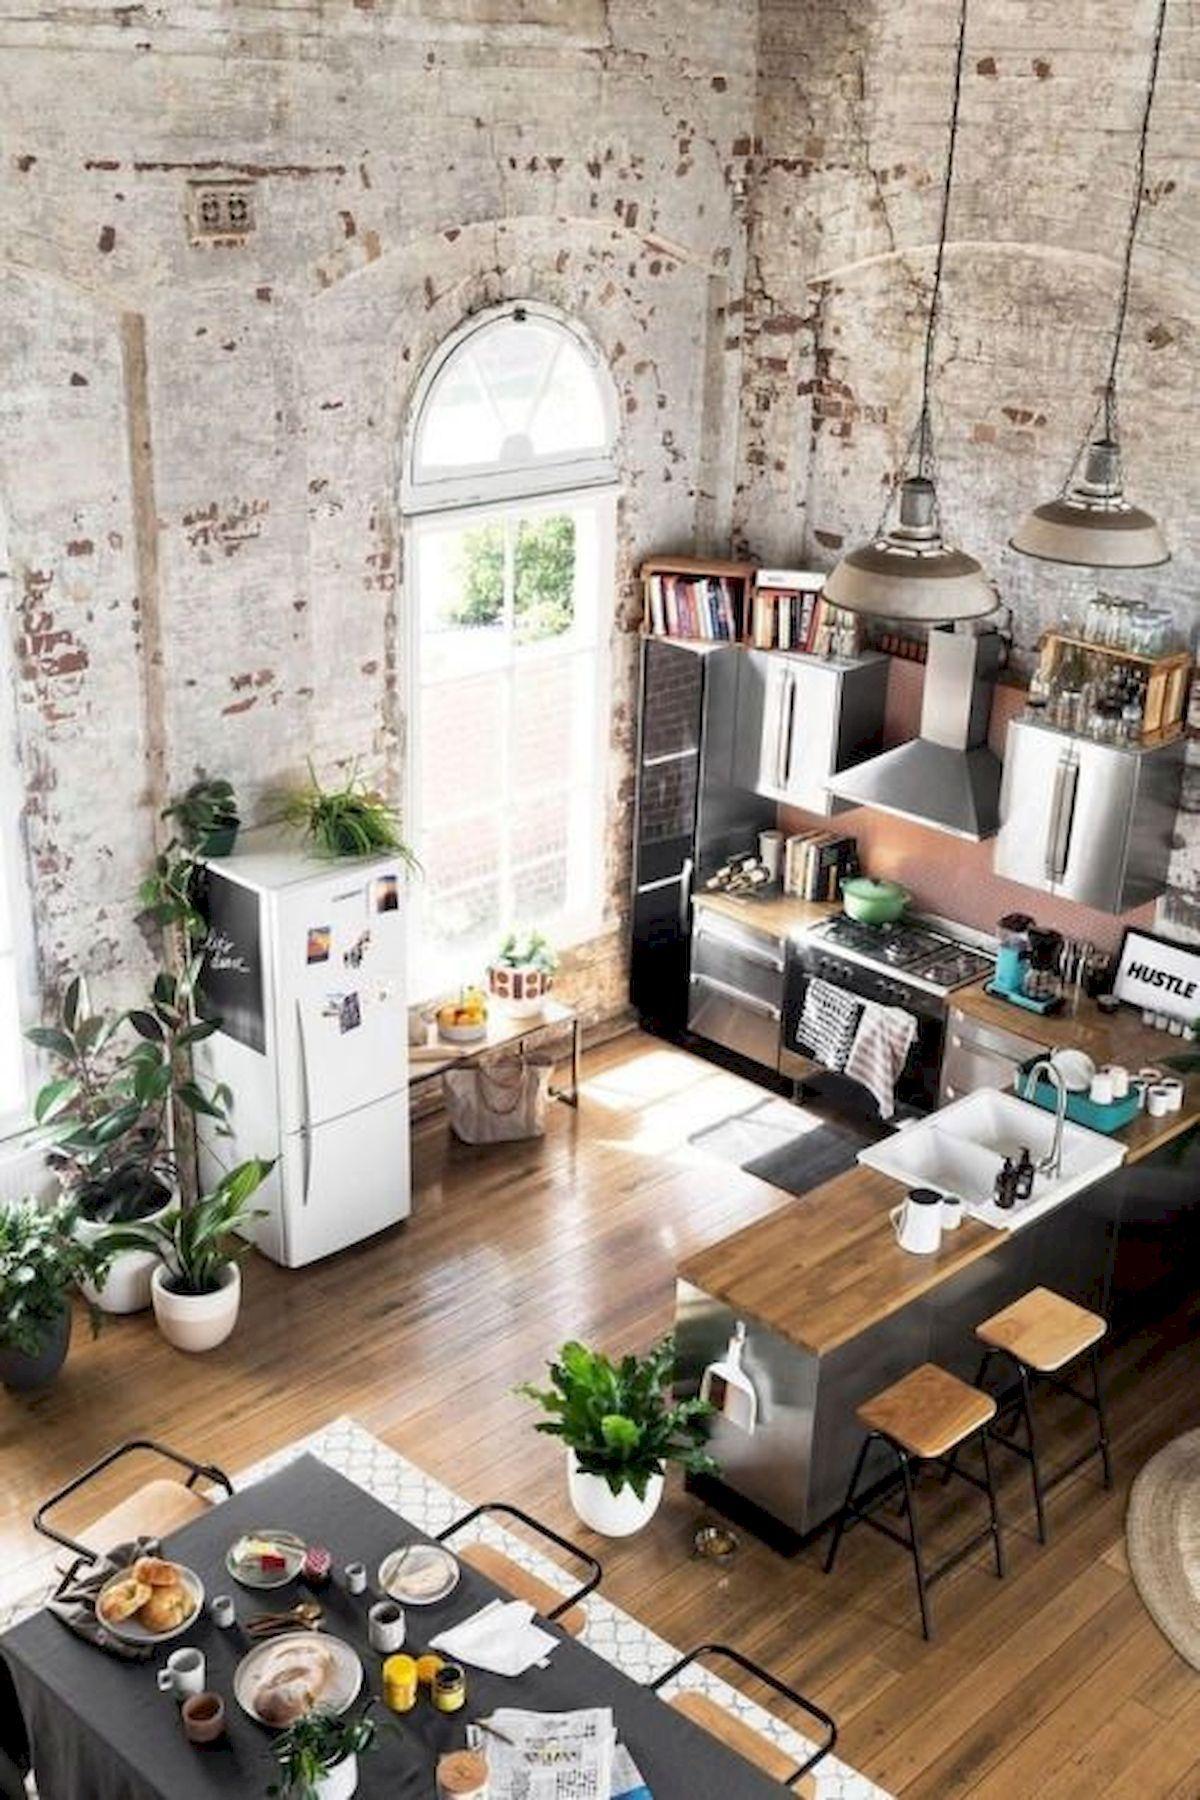 Adorable 40 Rustic Studio Apartment Decor Ideas Httpscoachdecorcom40